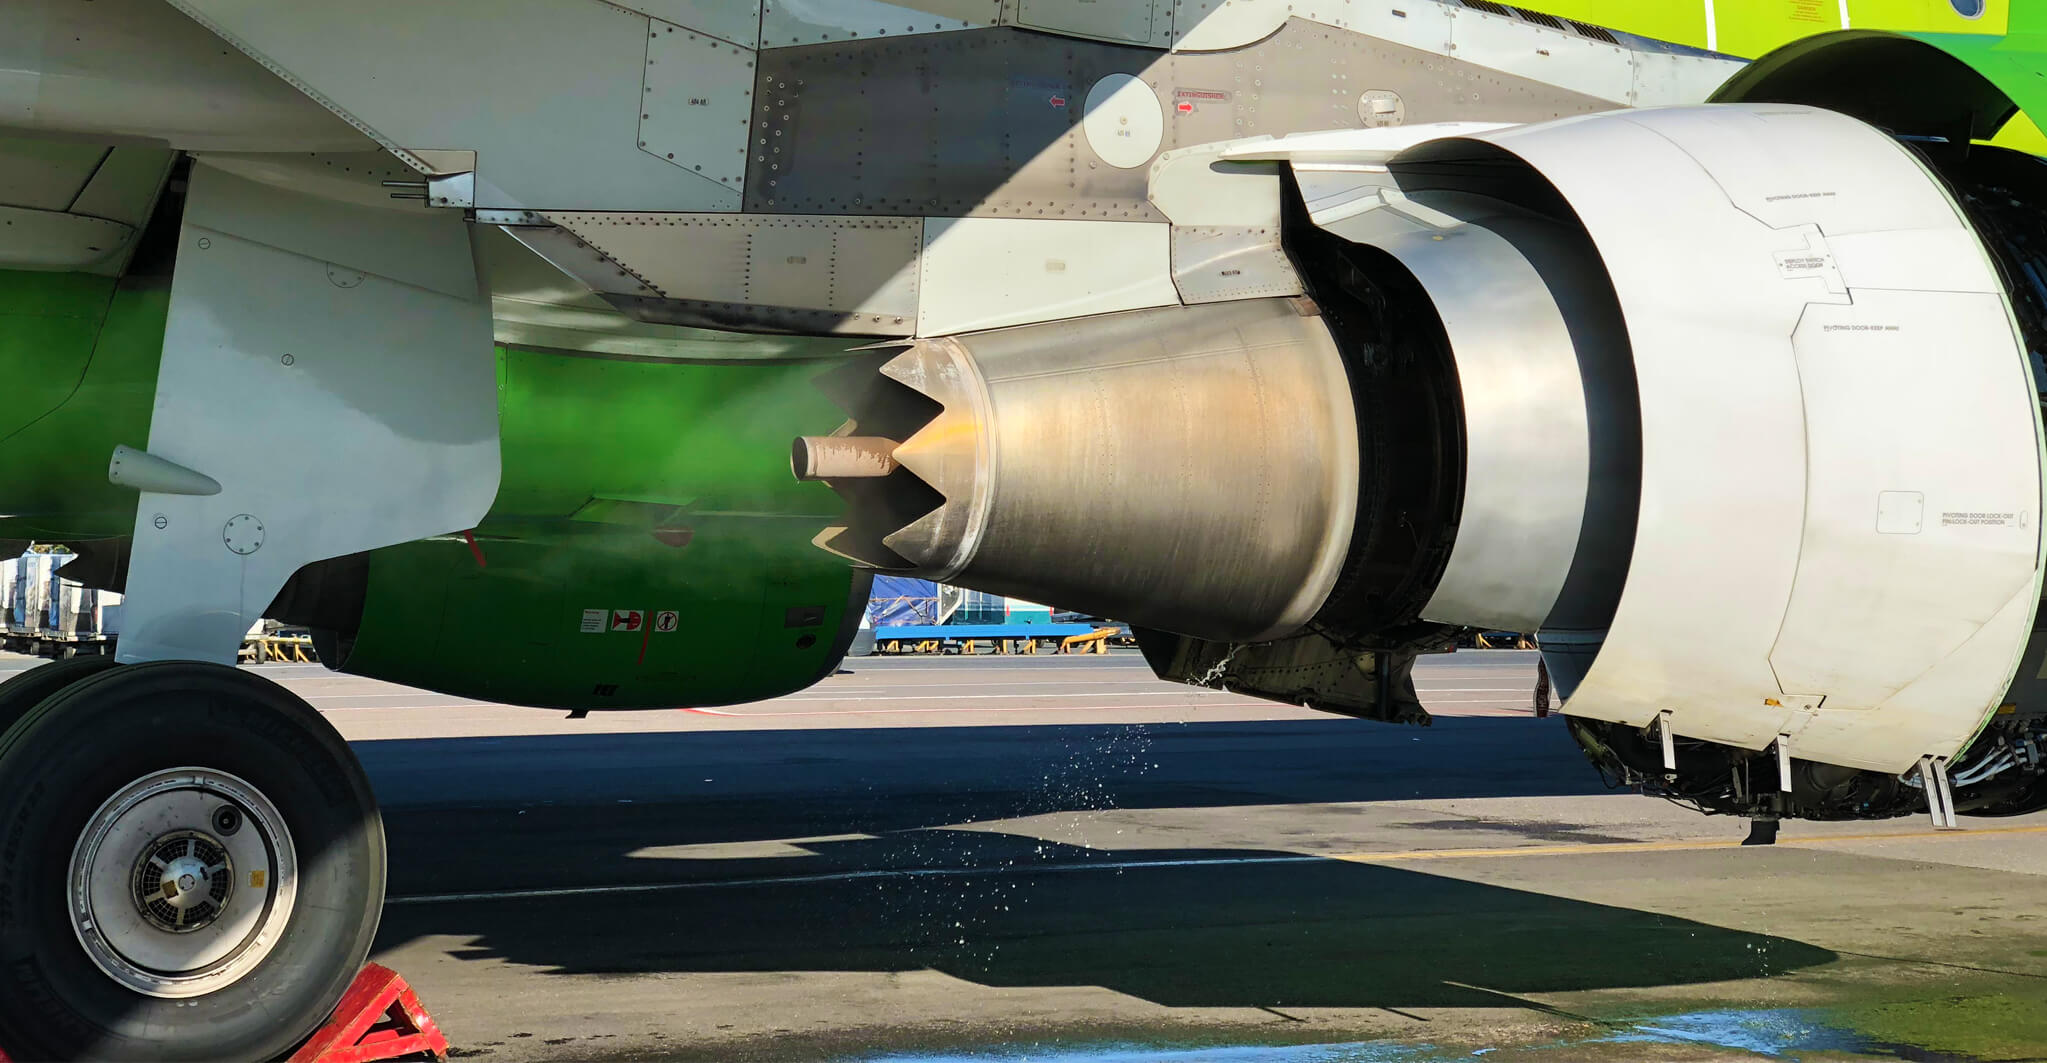 S7 Technics Holding adds engine wash capability – S7 Technics